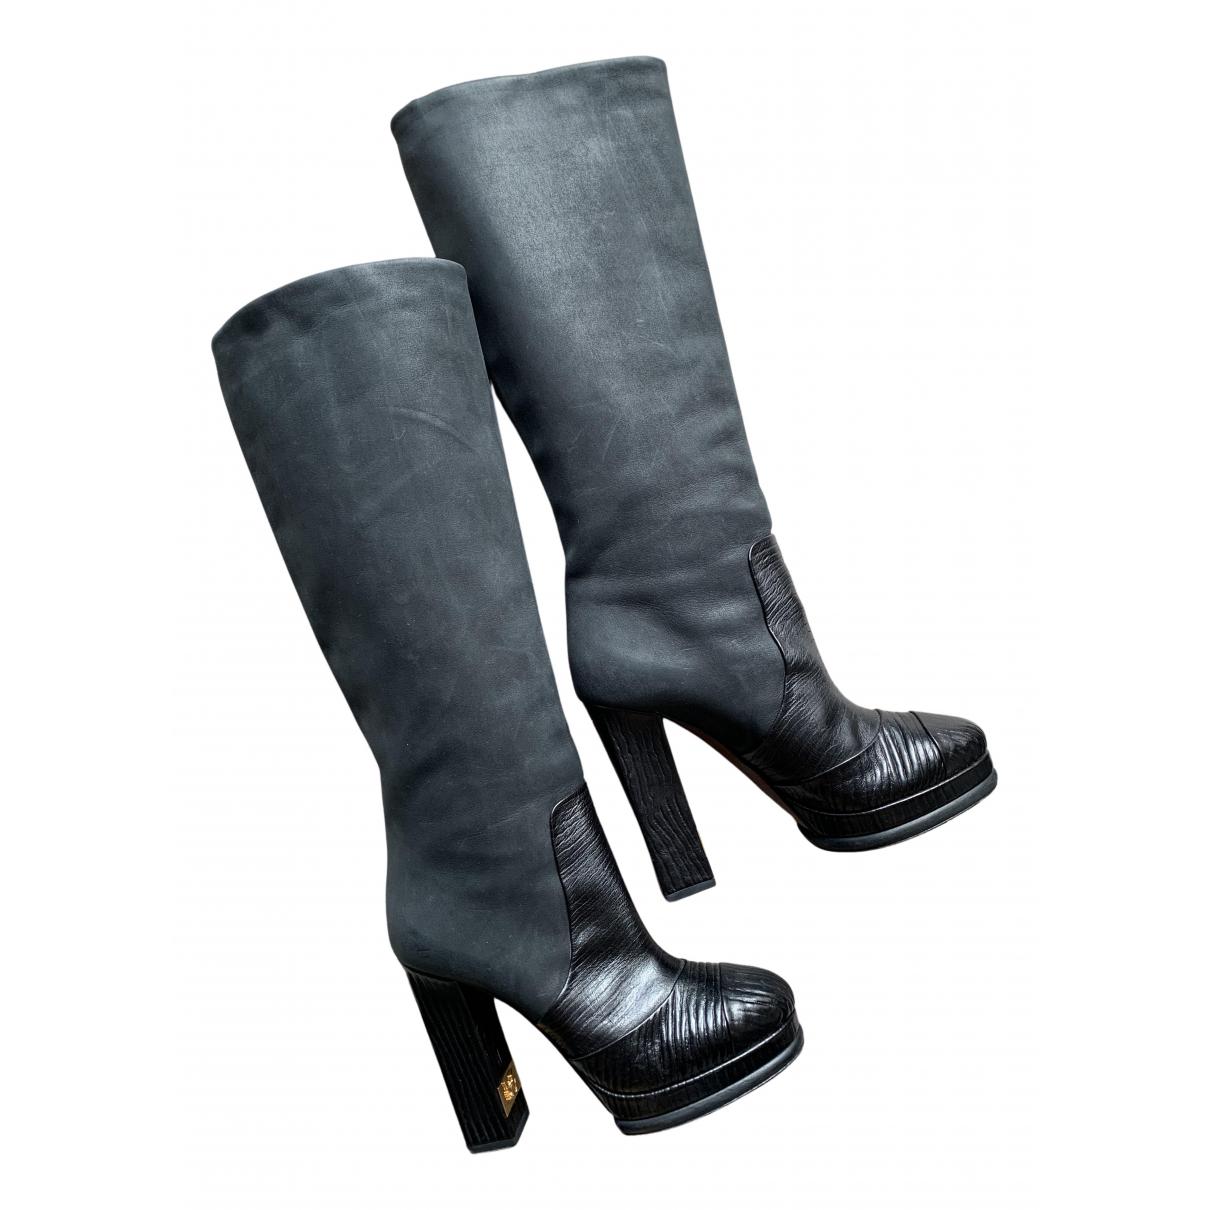 Chanel \N Stiefel in  Anthrazit Veloursleder